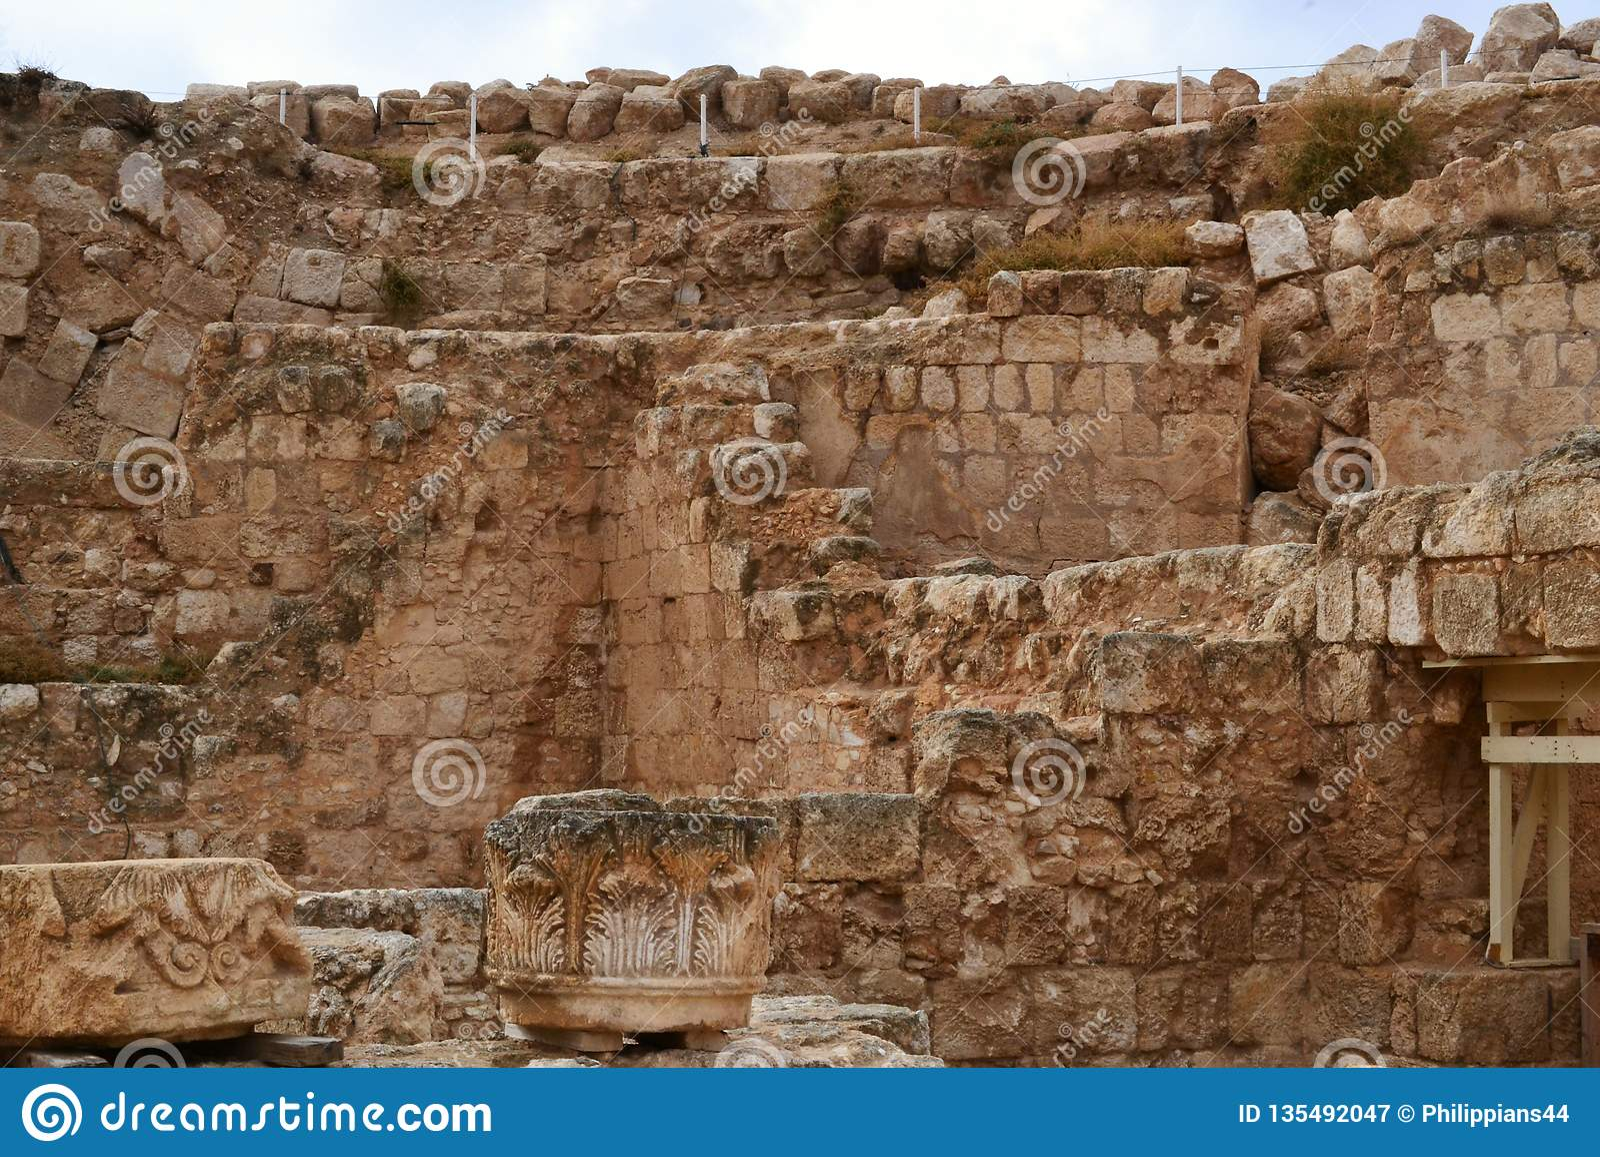 Herodium Herodion, fortaleza de Herod a grande, vista do território palestino, westbank, Palestina, Israel